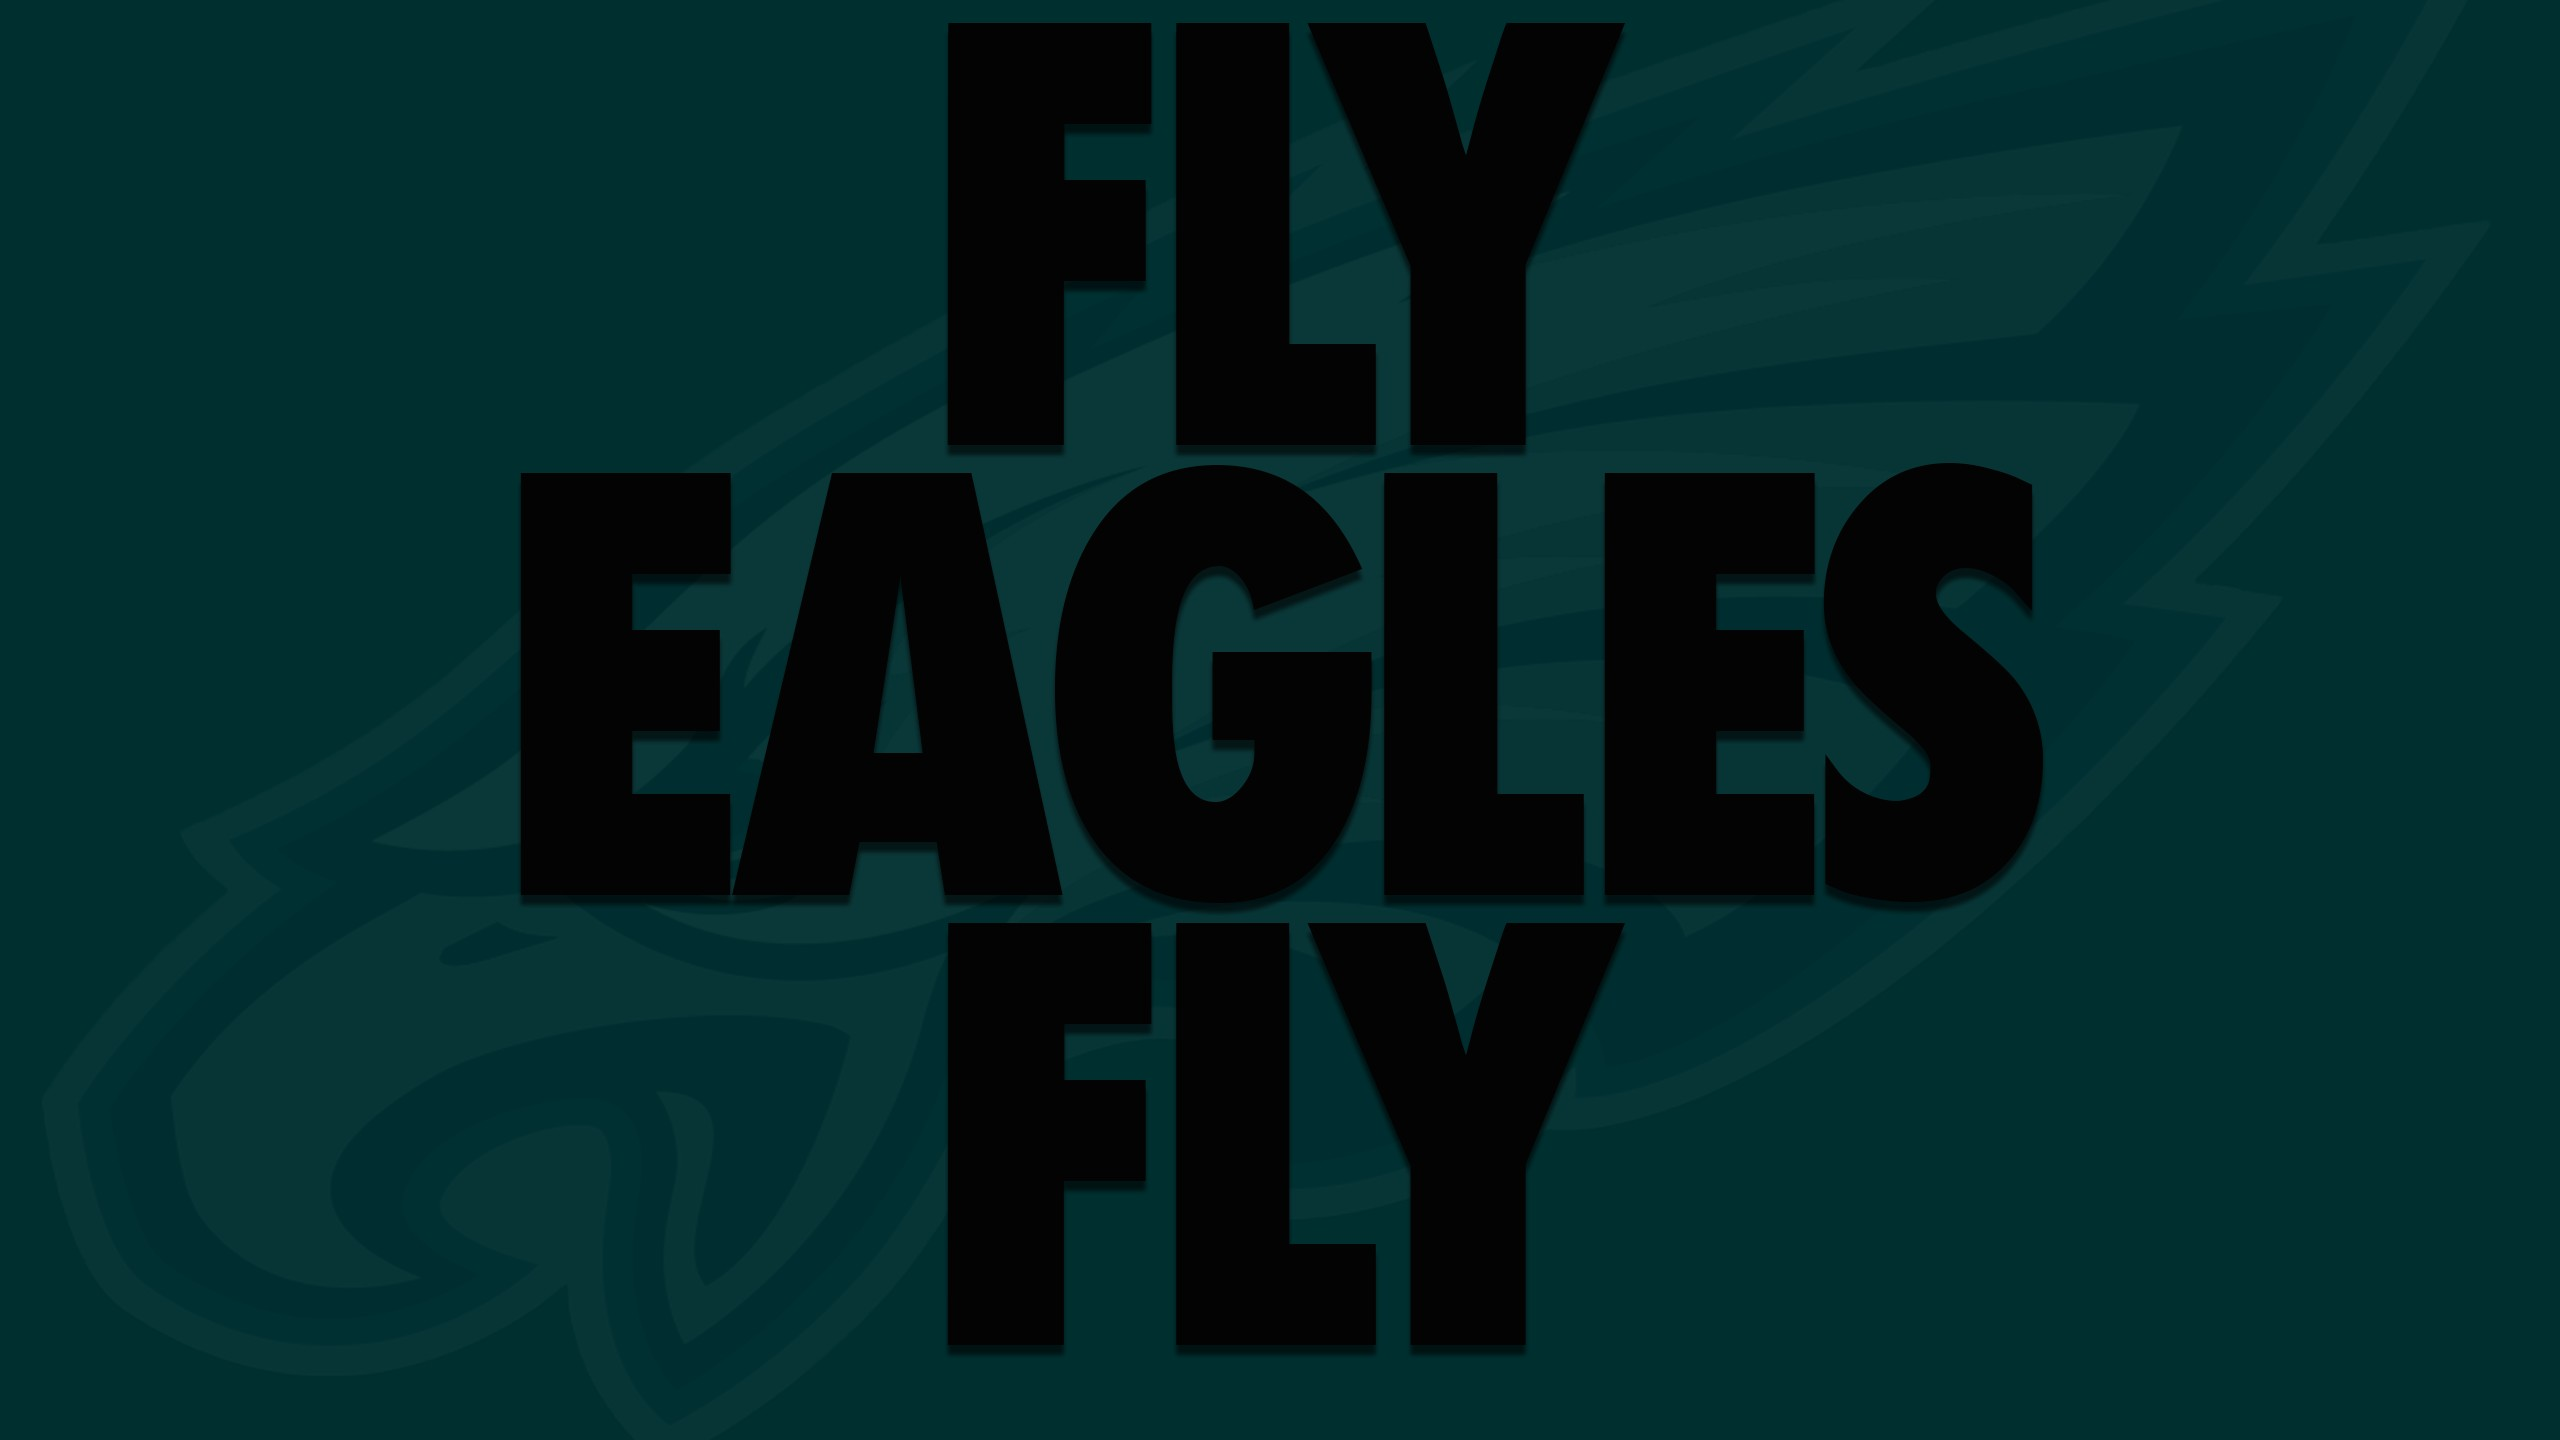 philadelphia eagles wallpaper 183�� download free amazing hd